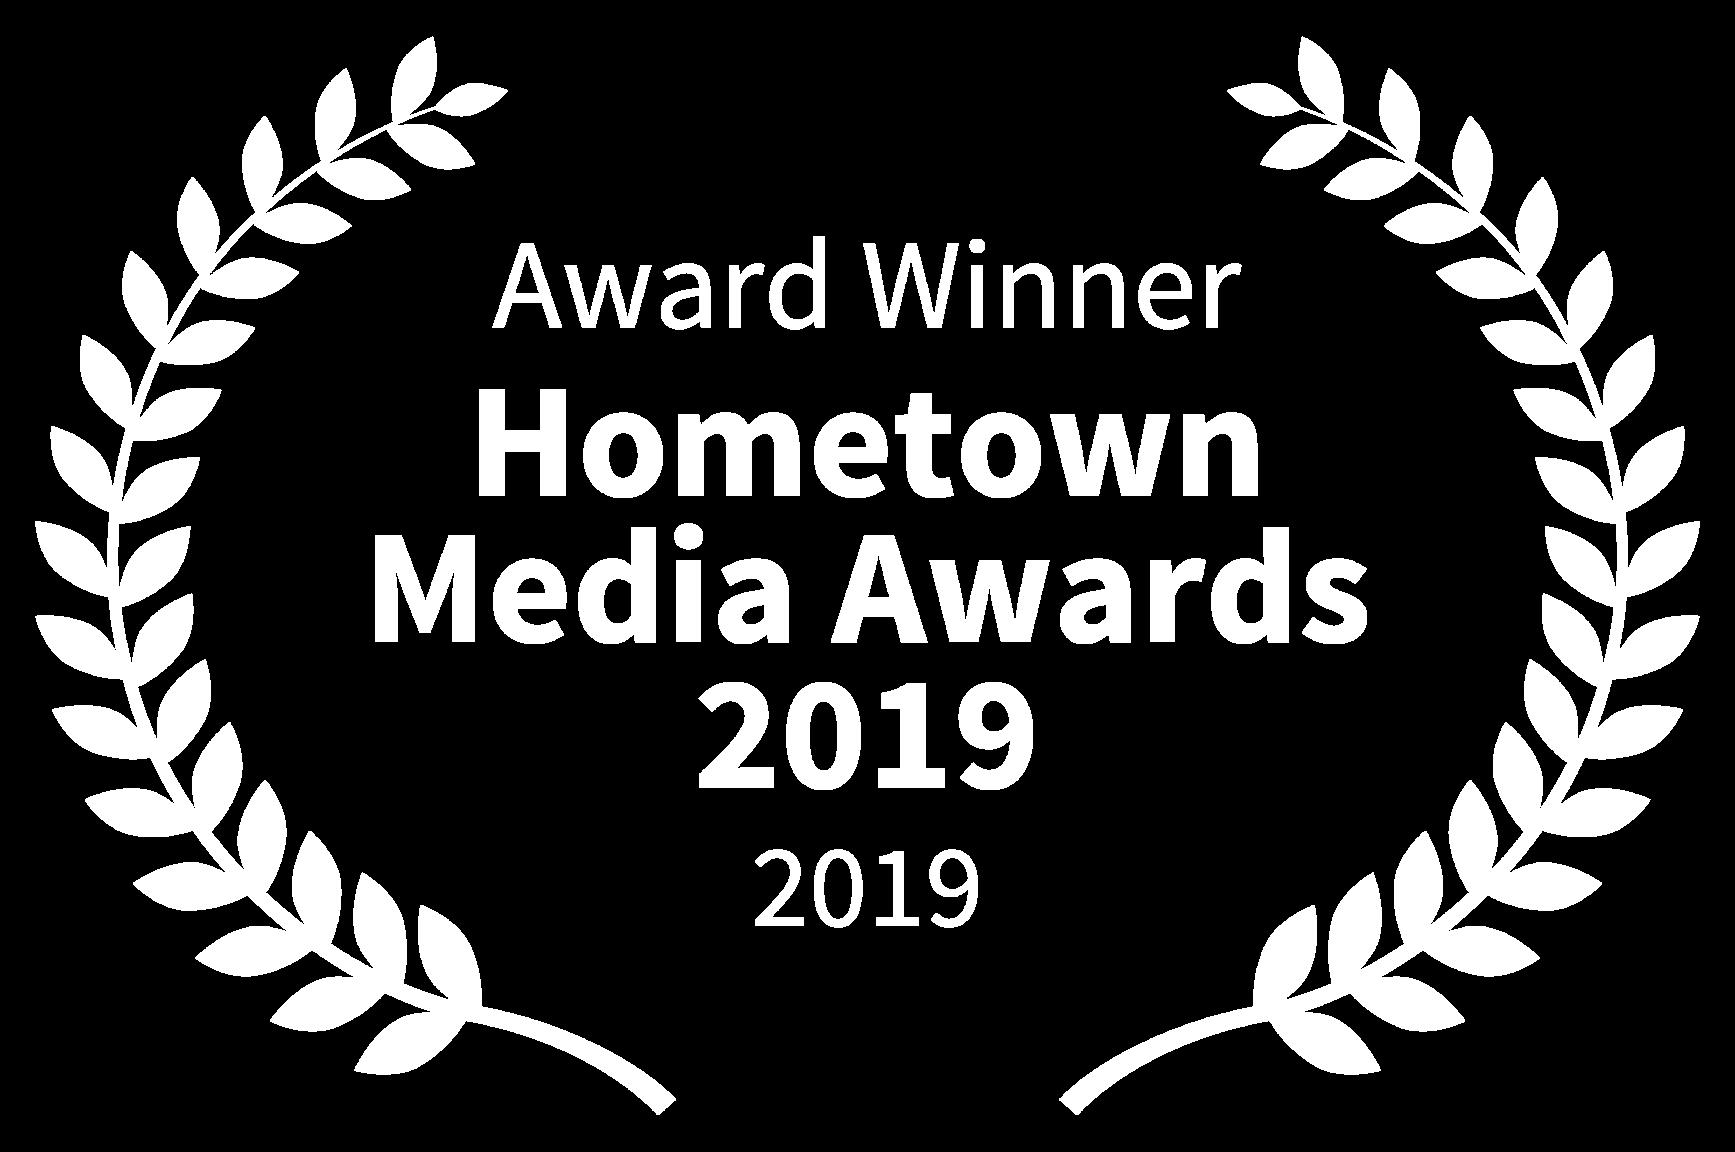 Award-Winner-Hometown-Media-Awards-2019-2019-1